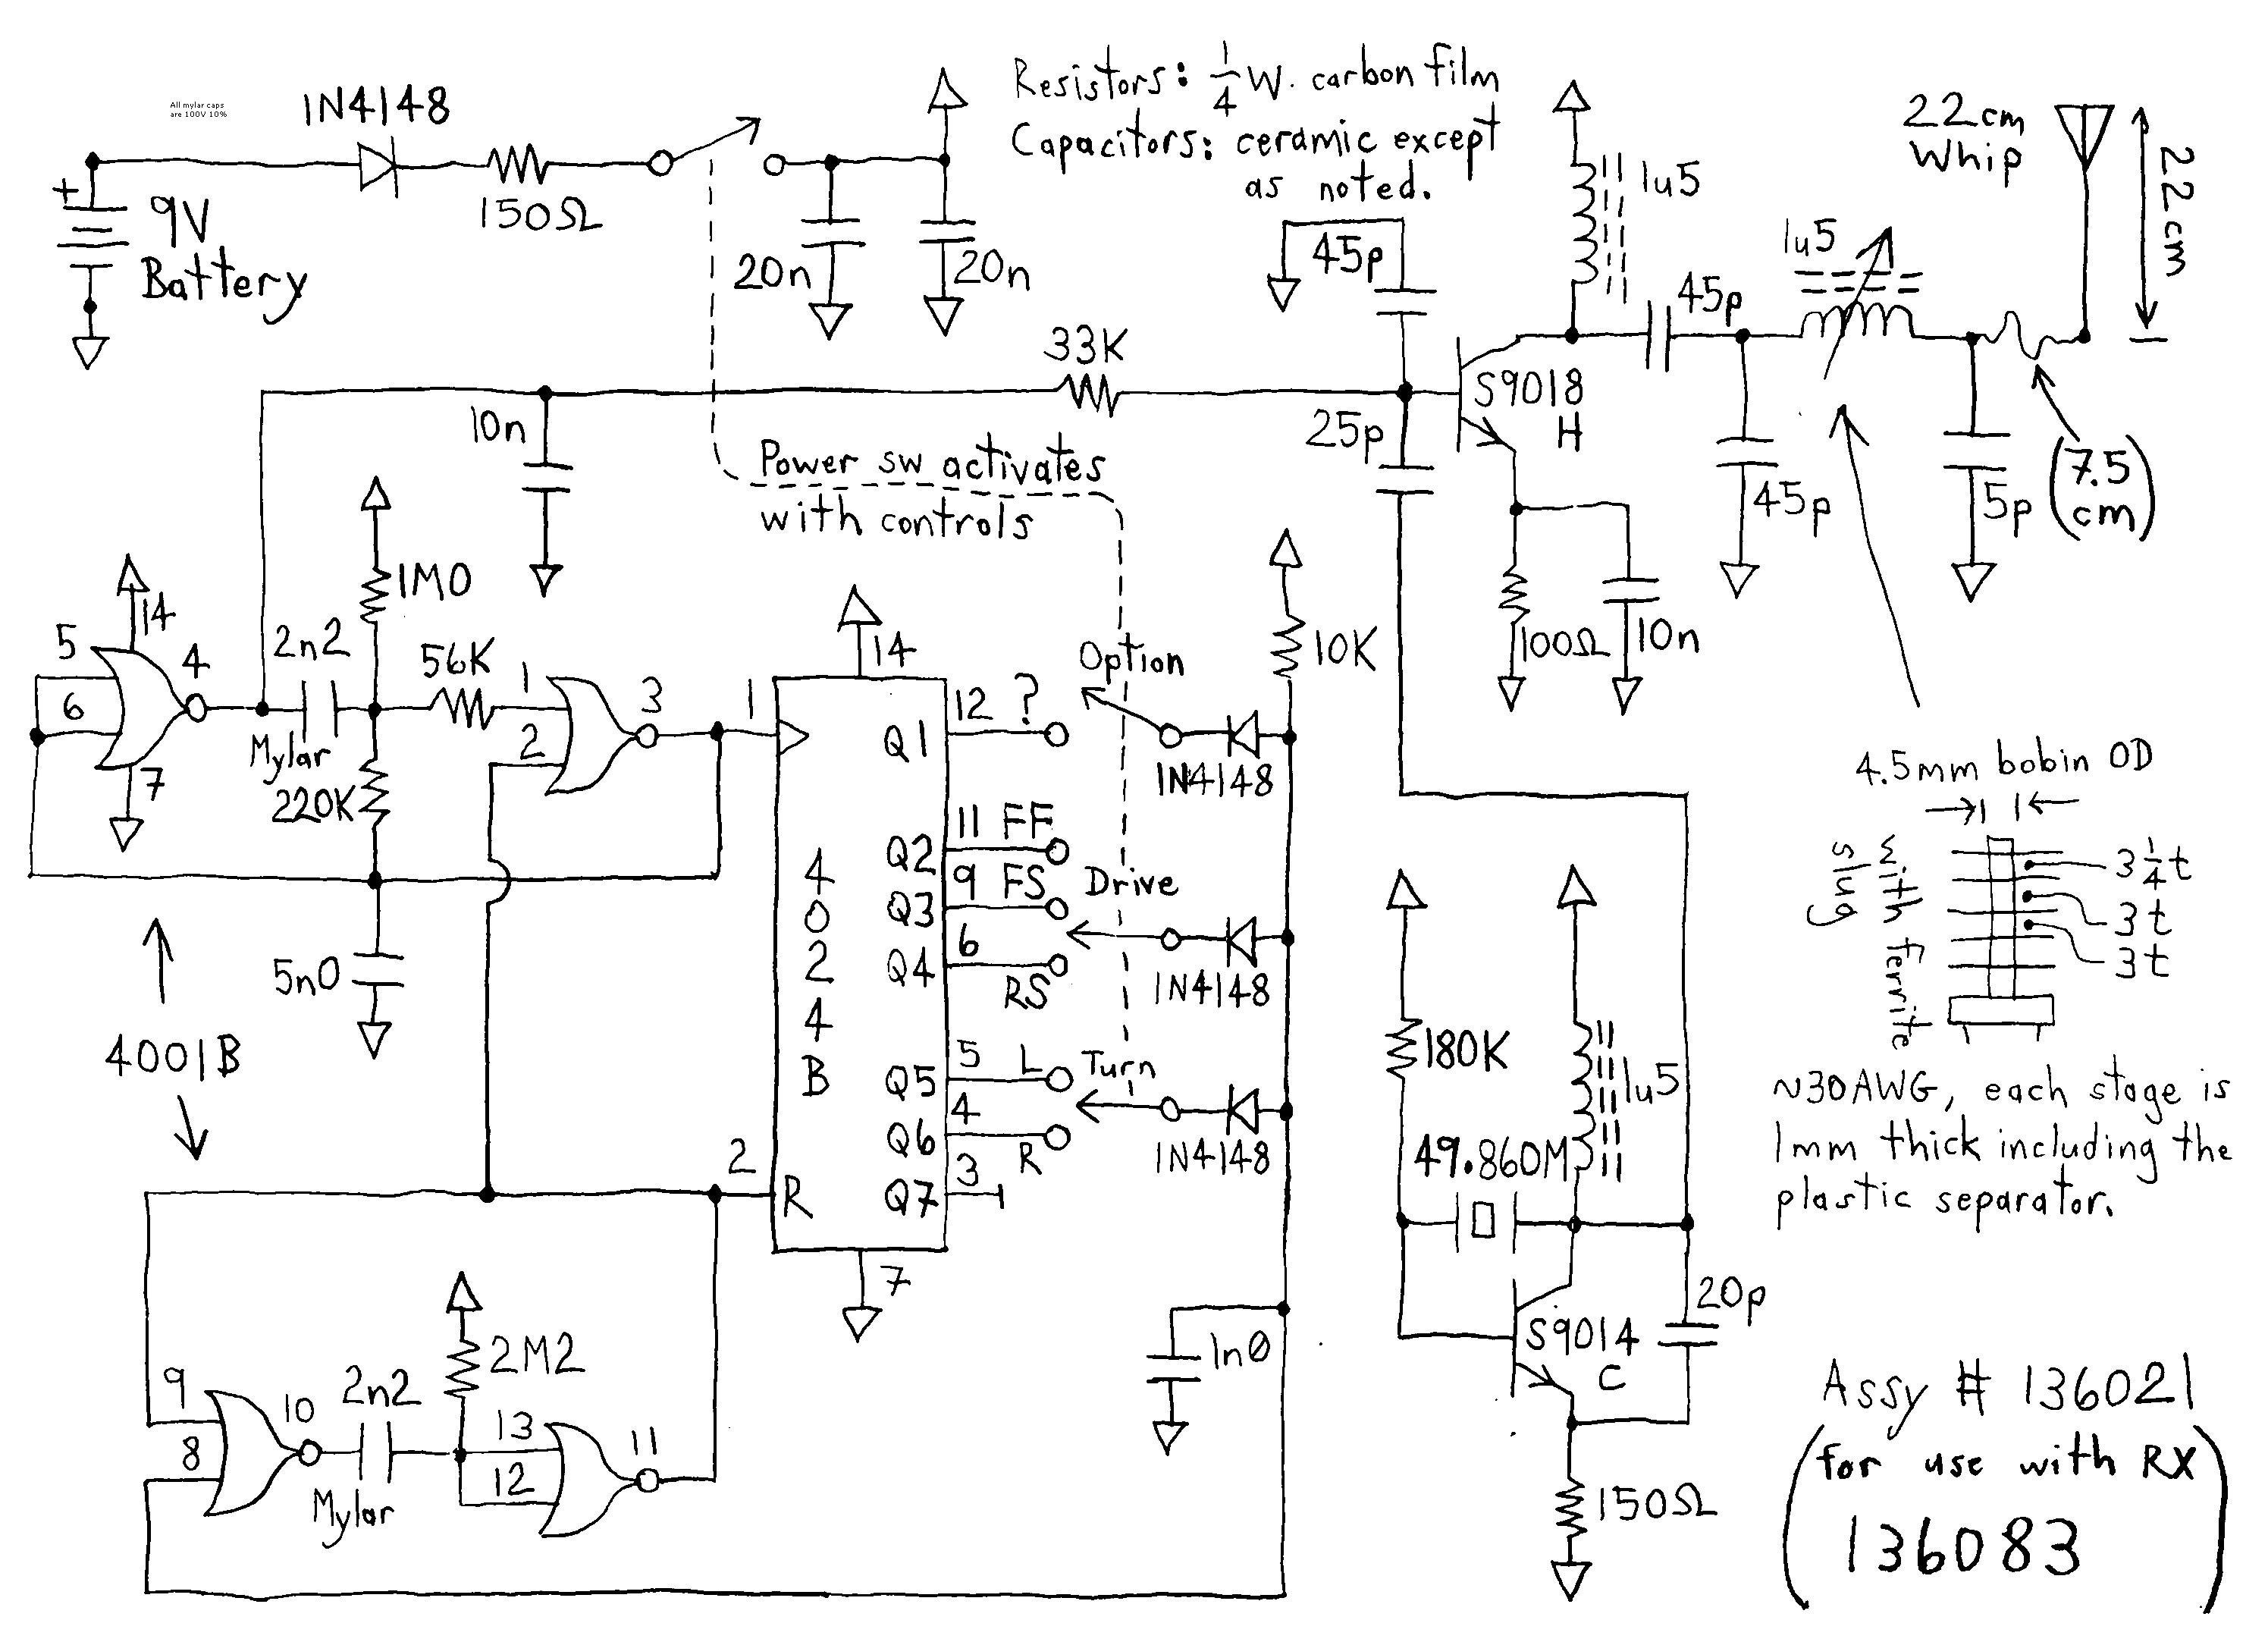 Car Subwoofer Diagram Multiple Amplifier Wiring Diagram Best Amp Wiring Diagram Car Of Car Subwoofer Diagram